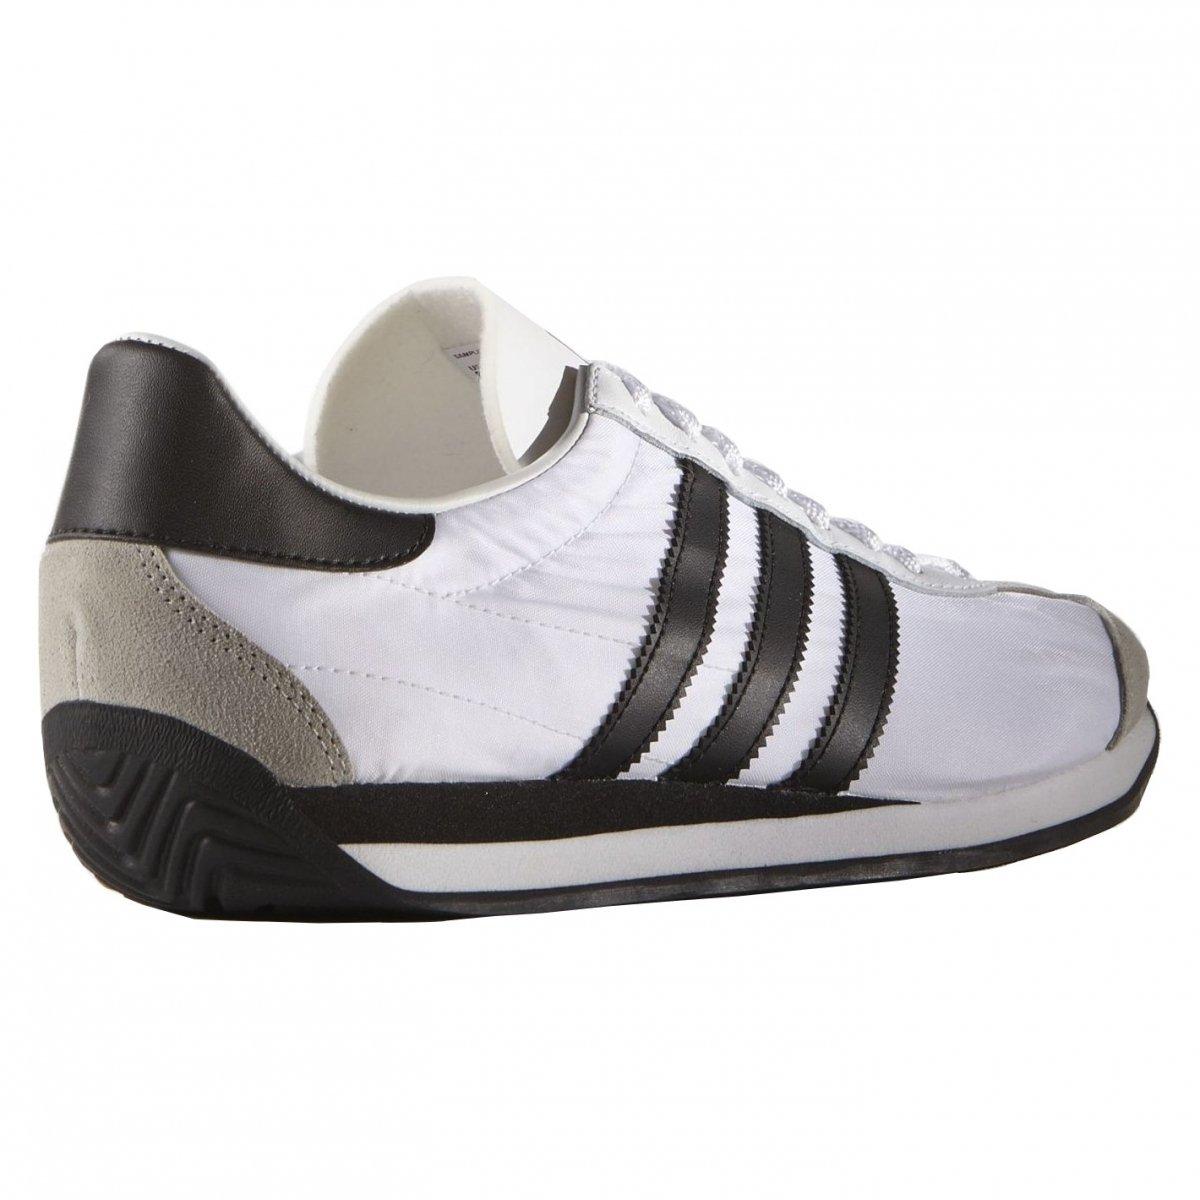 purchase cheap c80ee af853 chaussures chaussures adidas originals pays pays pays og hommes s  athlétique   Que Nos Produits Vont